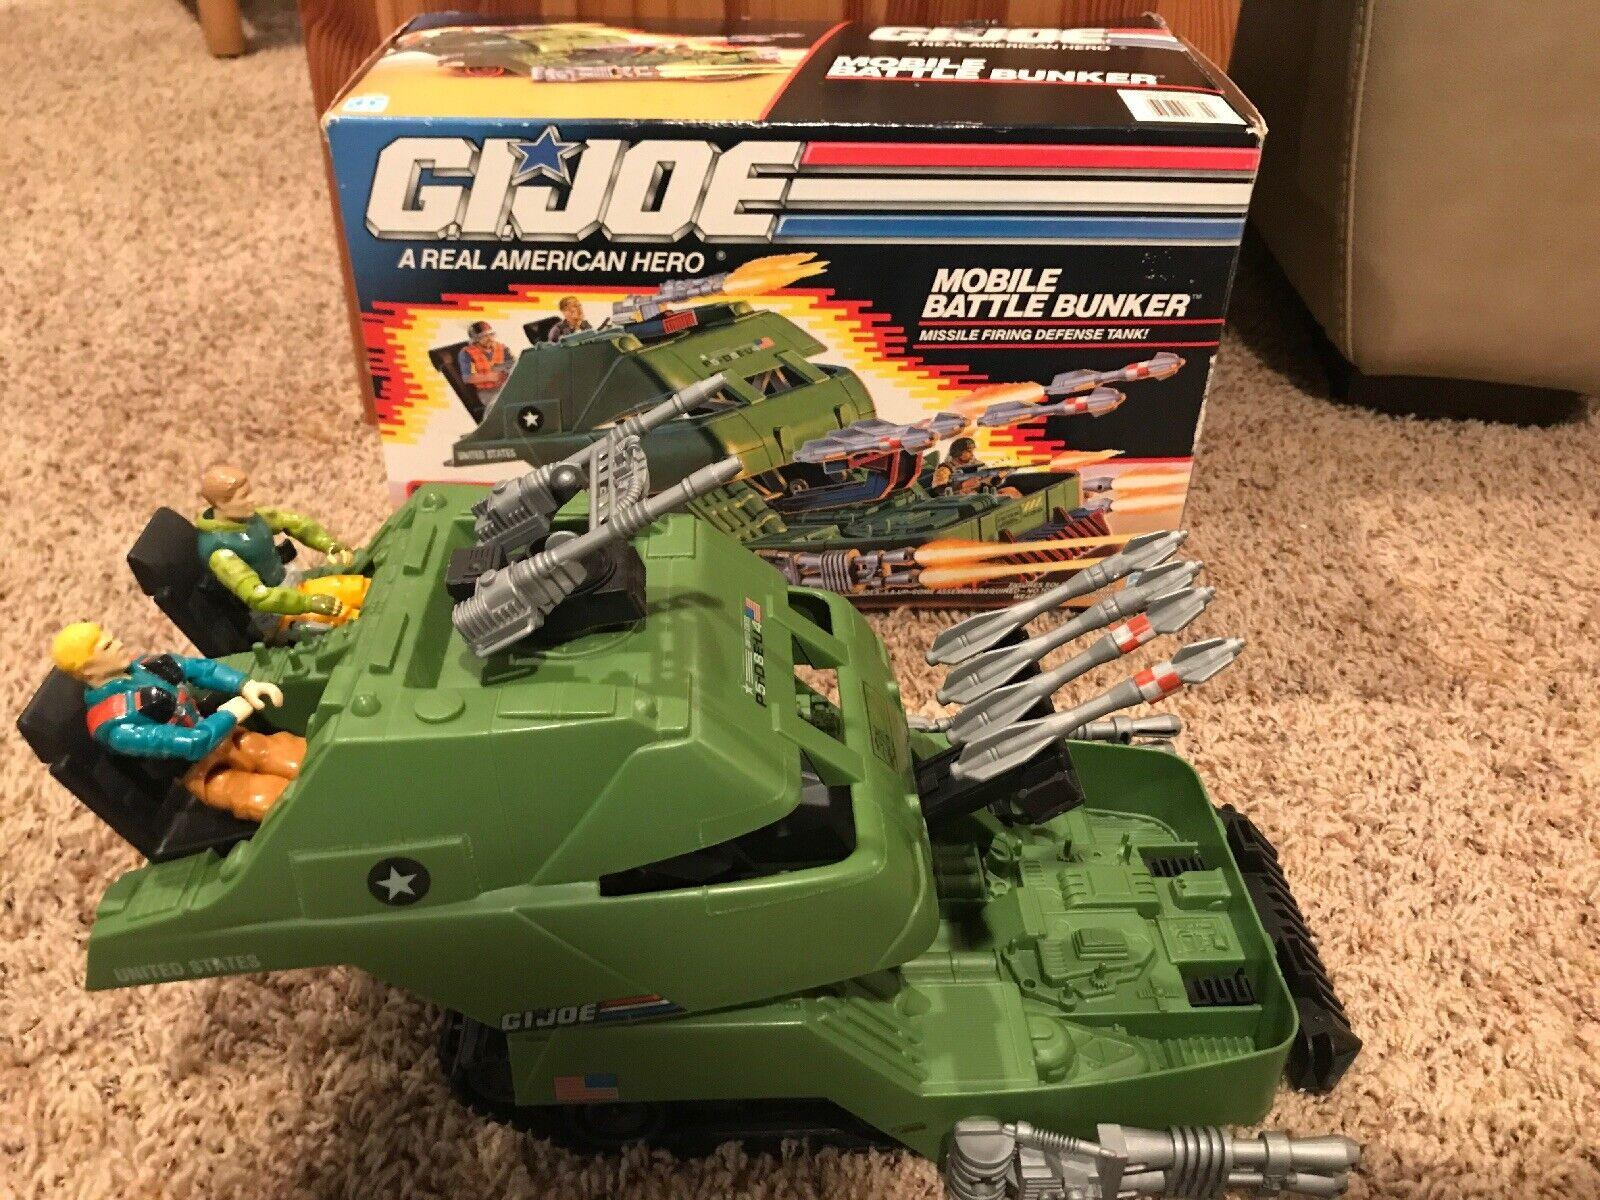 Vintage GI g.I. Joe Joe Joe Mobile Battle Bunker W  Box & Extra Figures 1990 Hasbro bfcd01